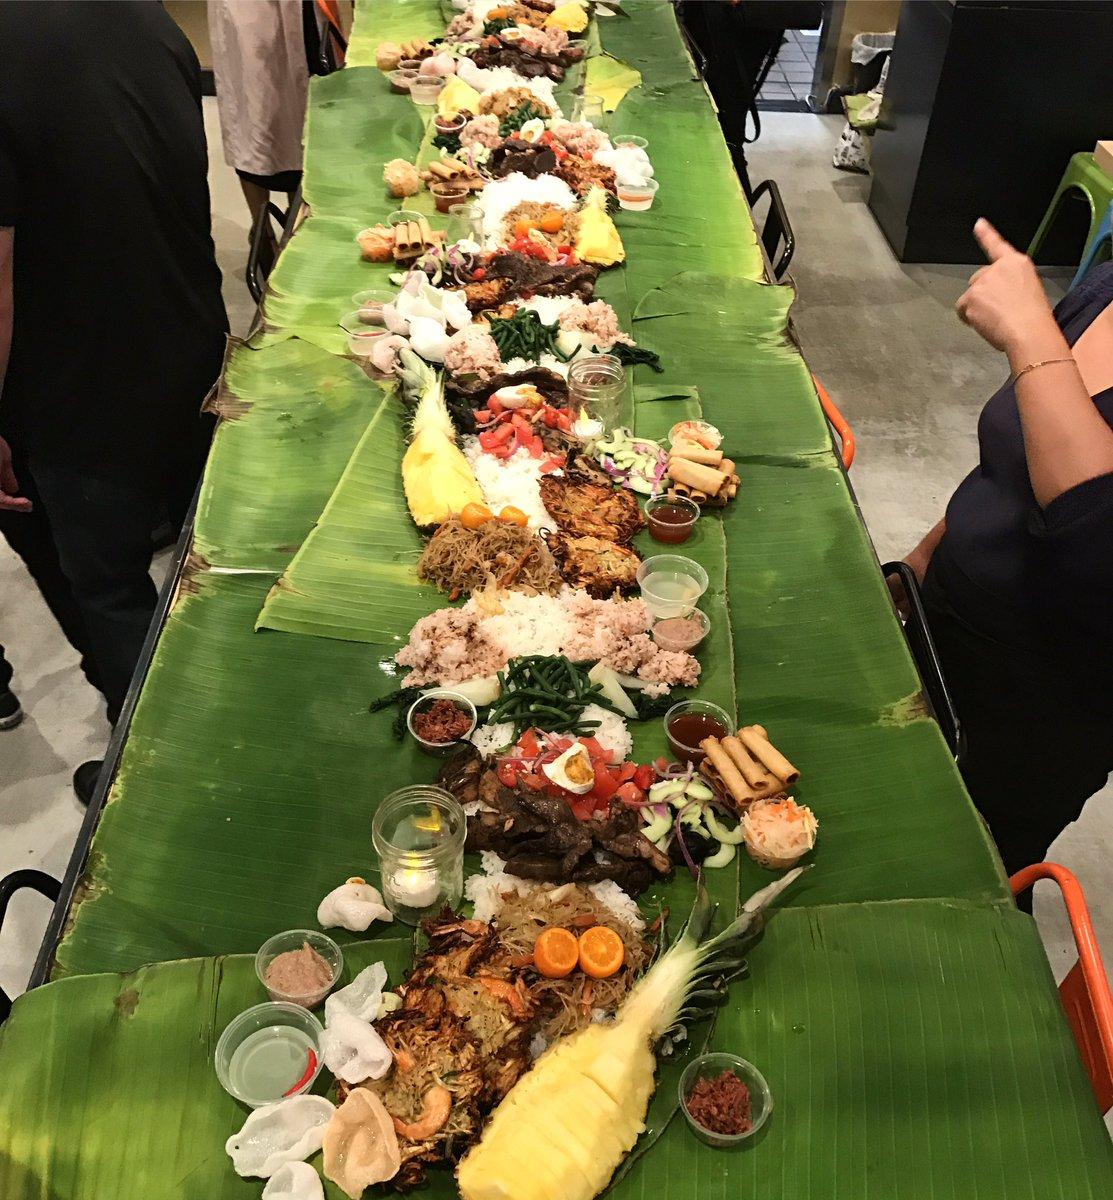 elatedpalate on Twitter  Kamayan Feast pop up by @carolineadobo and @dadthebaker Kamayan Dinner lots of food on top of banana leaves u2022no platesu2022no ... & elatedpalate on Twitter: